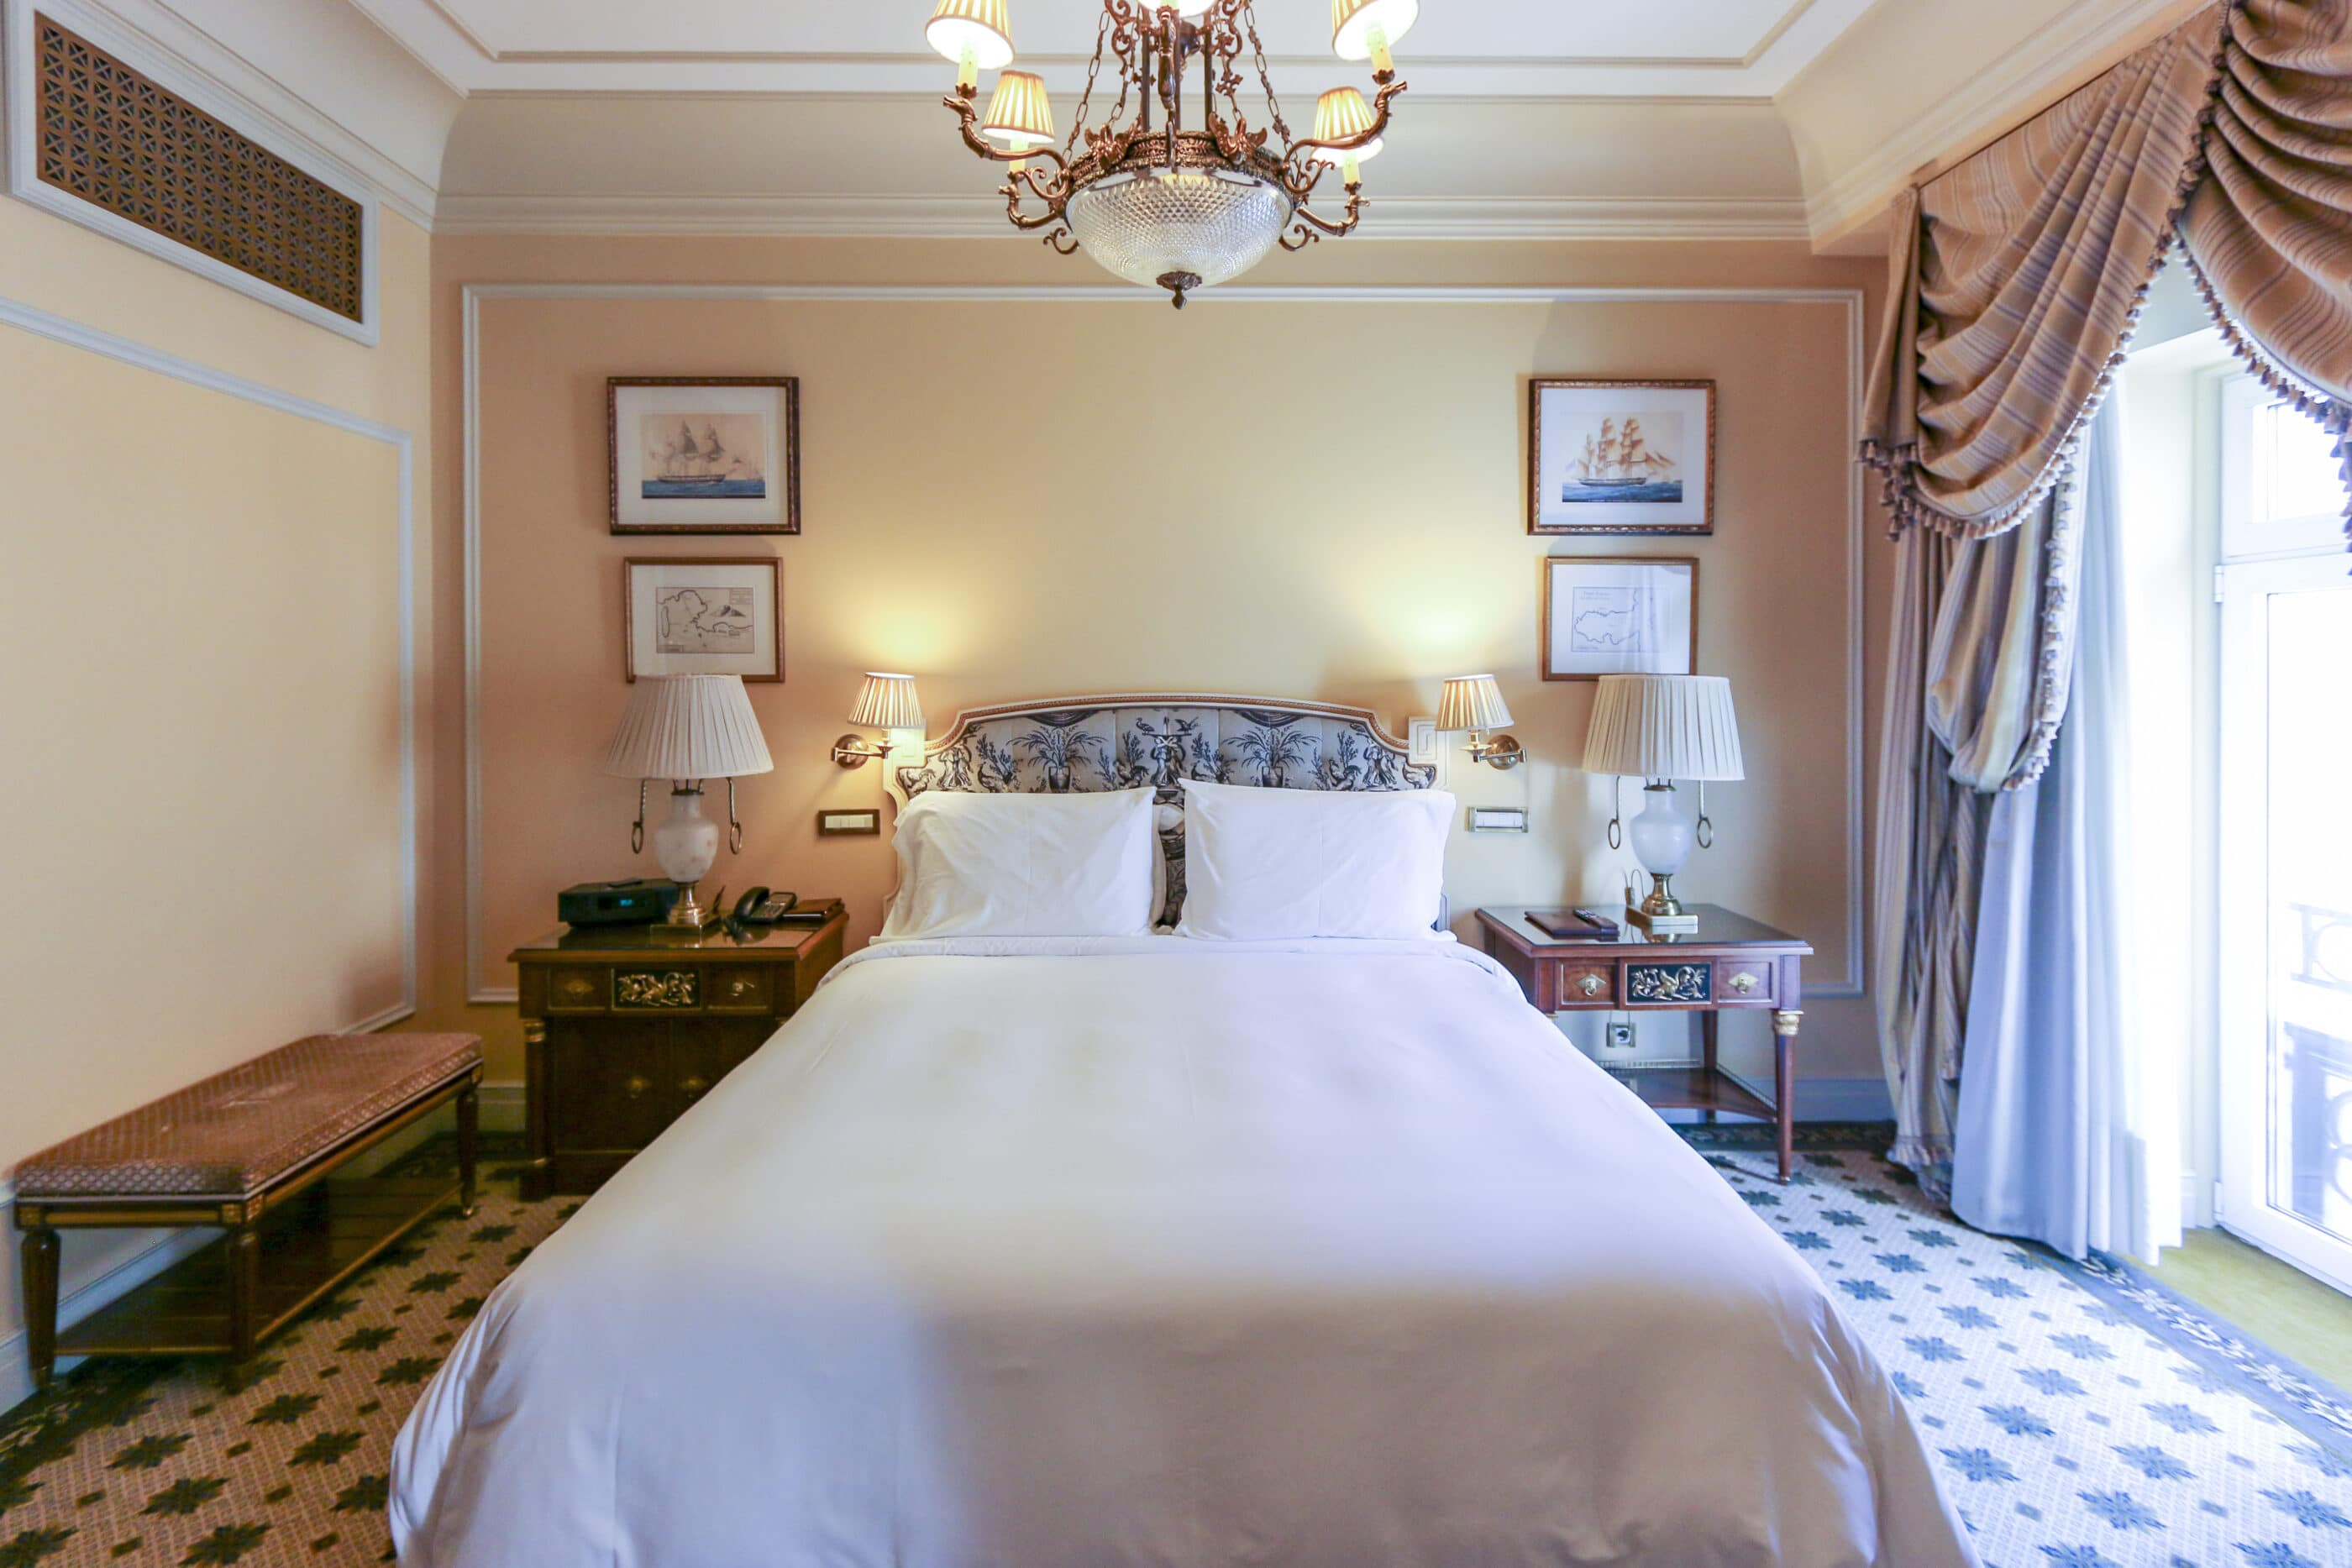 Bedroom of a Deluxe Suite at Hotel Grande Bretagne